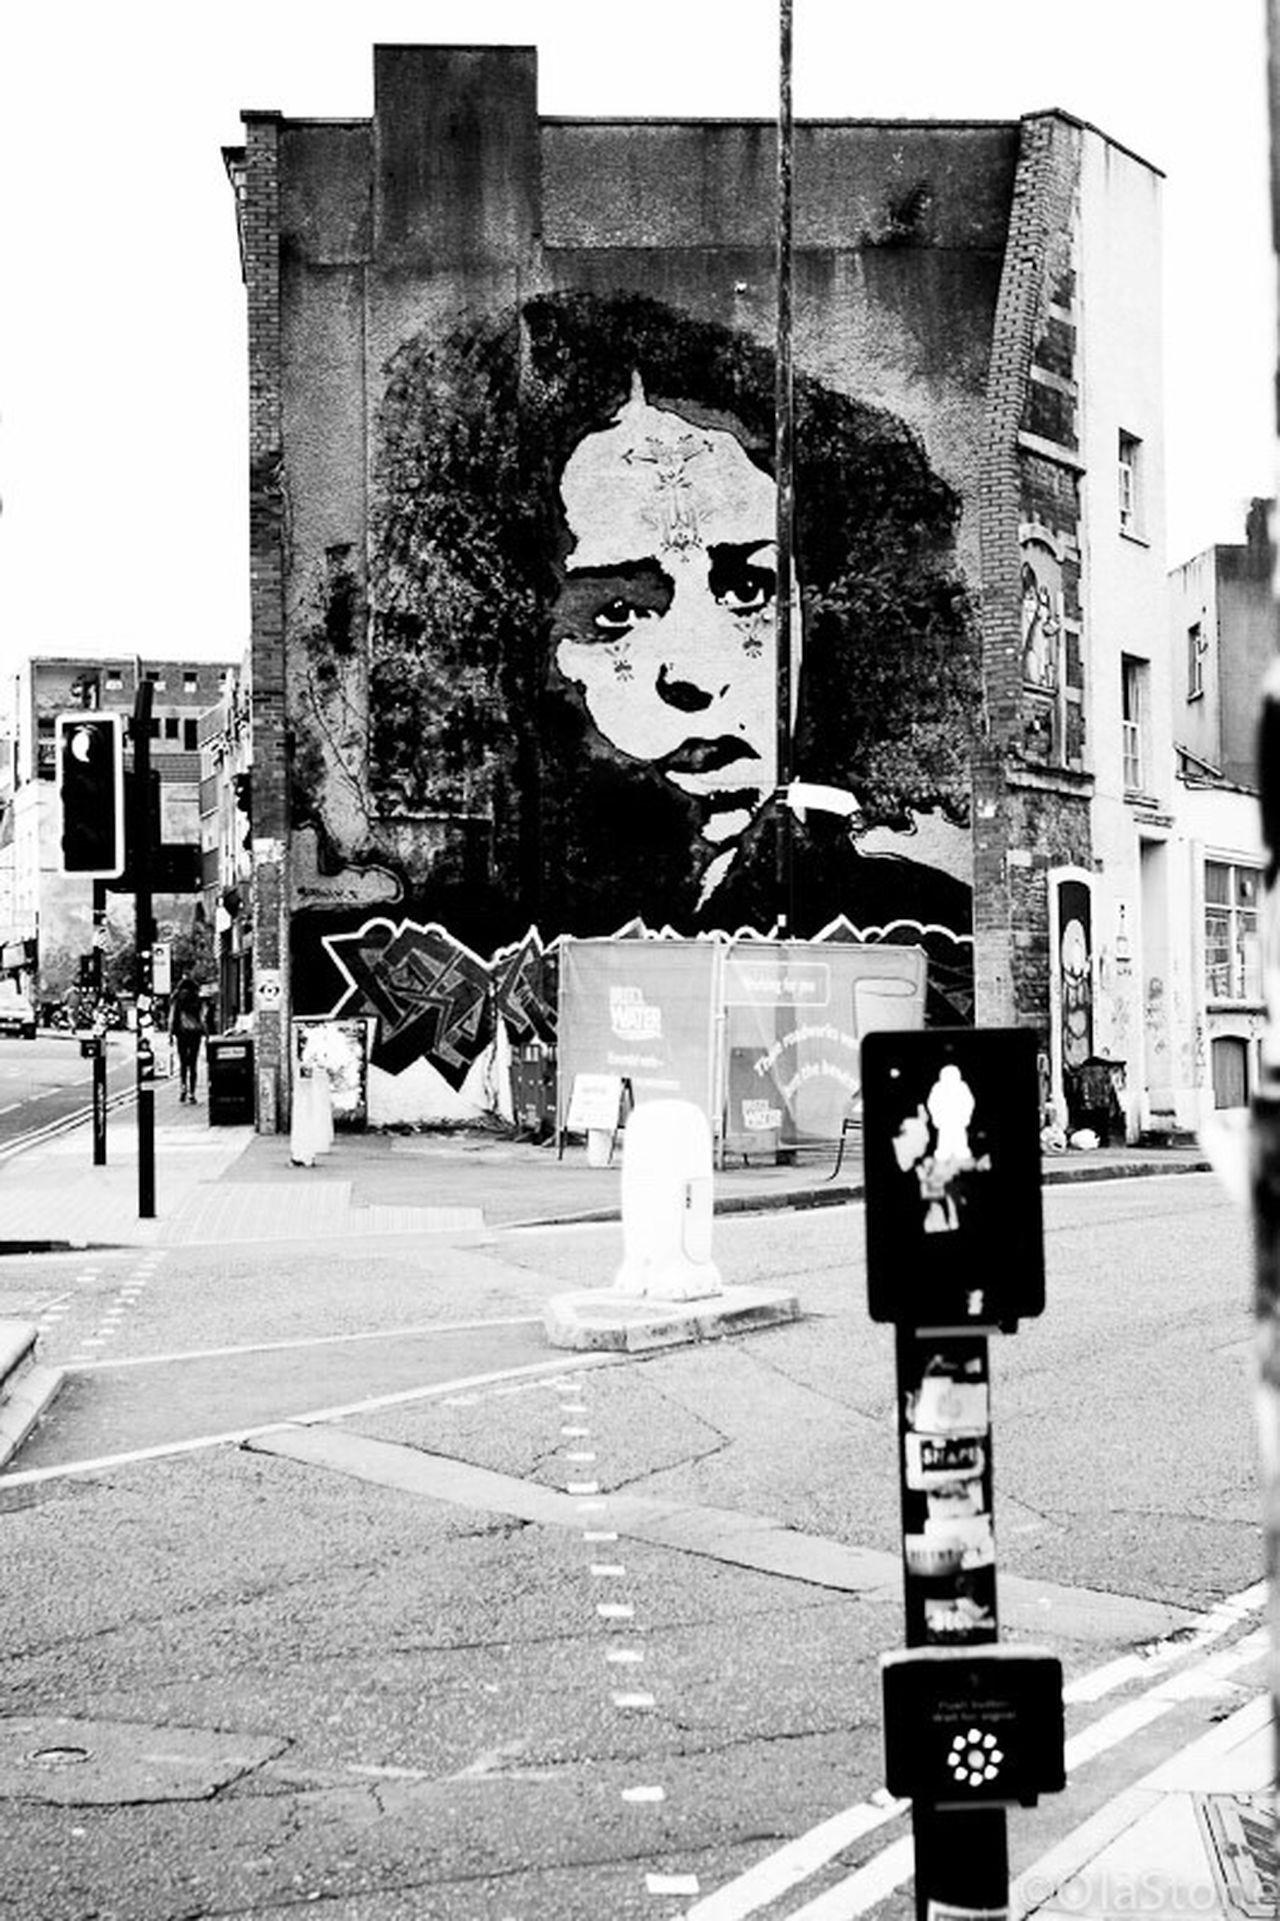 Neighborhood Map Stokes Croft Graffiti Monochrome Photography Pelicancrossing Crossroads